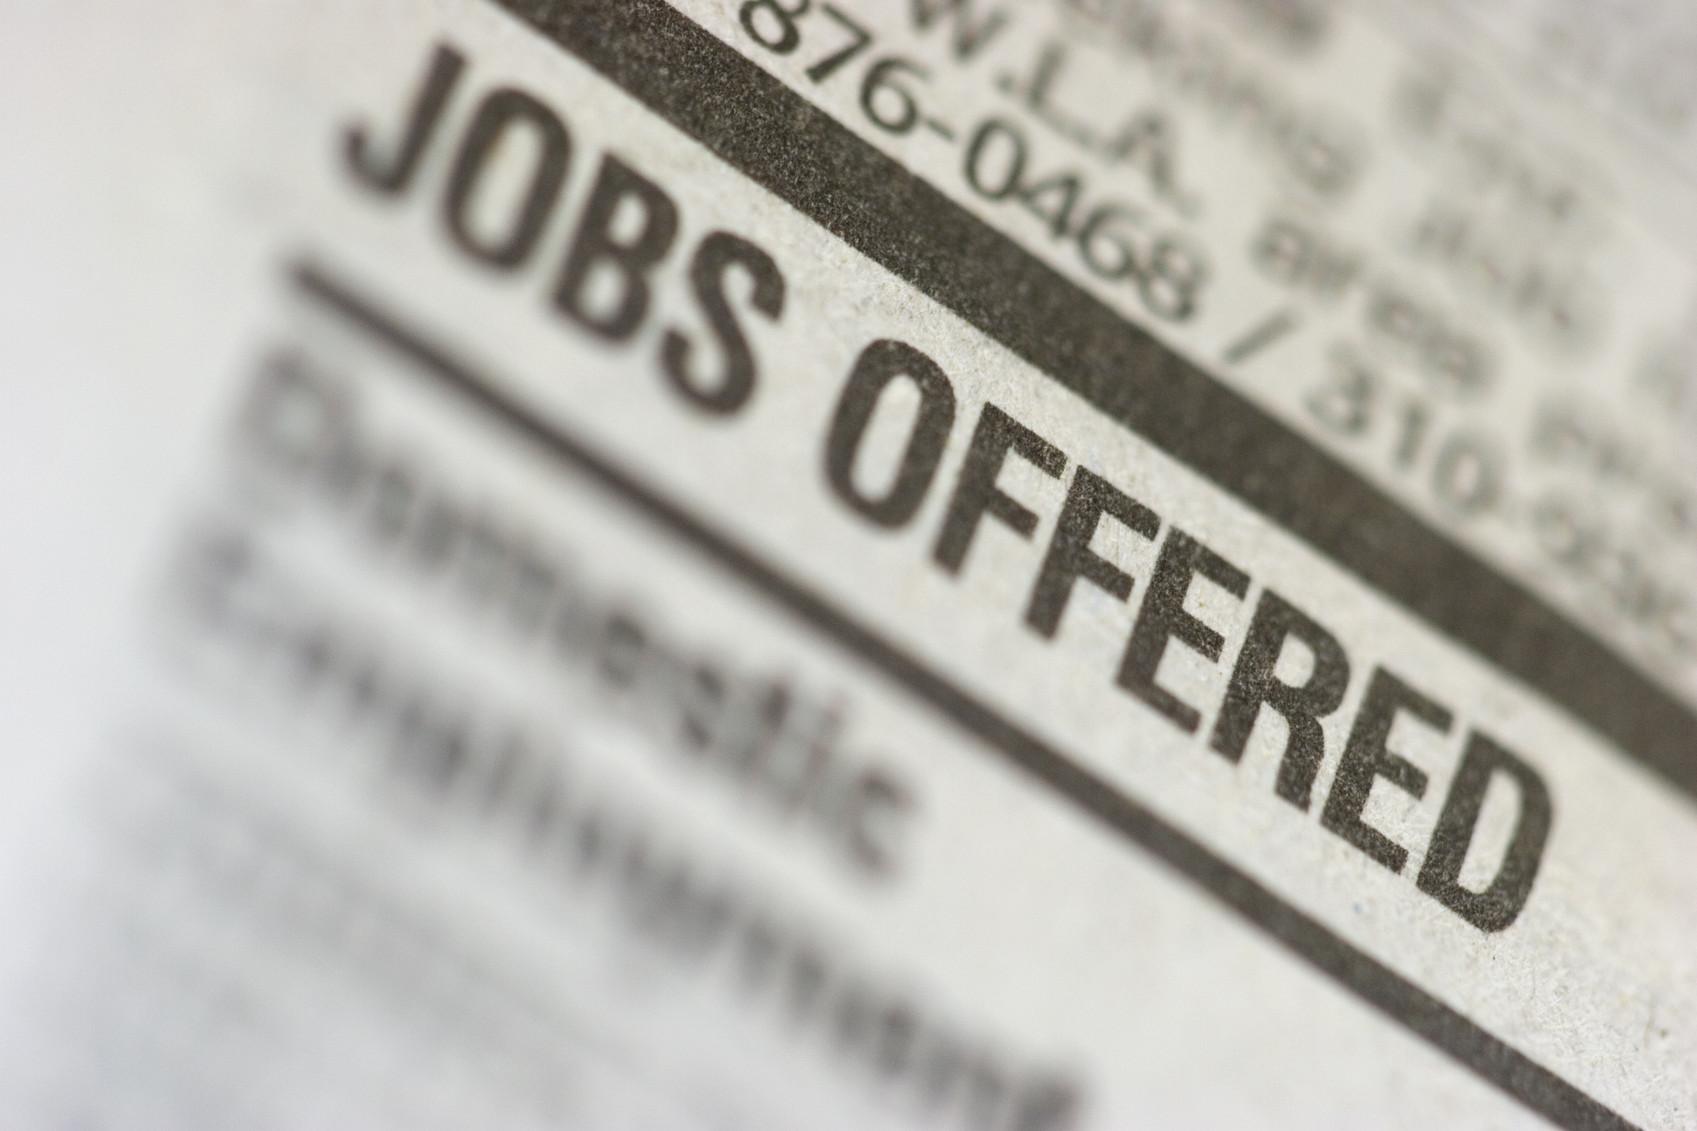 s choosing the right job super life coach jobhunting middot savvyconsumer files wordpress com 2008 05 luckyoliver 1127573 medium job hunting1 jpg